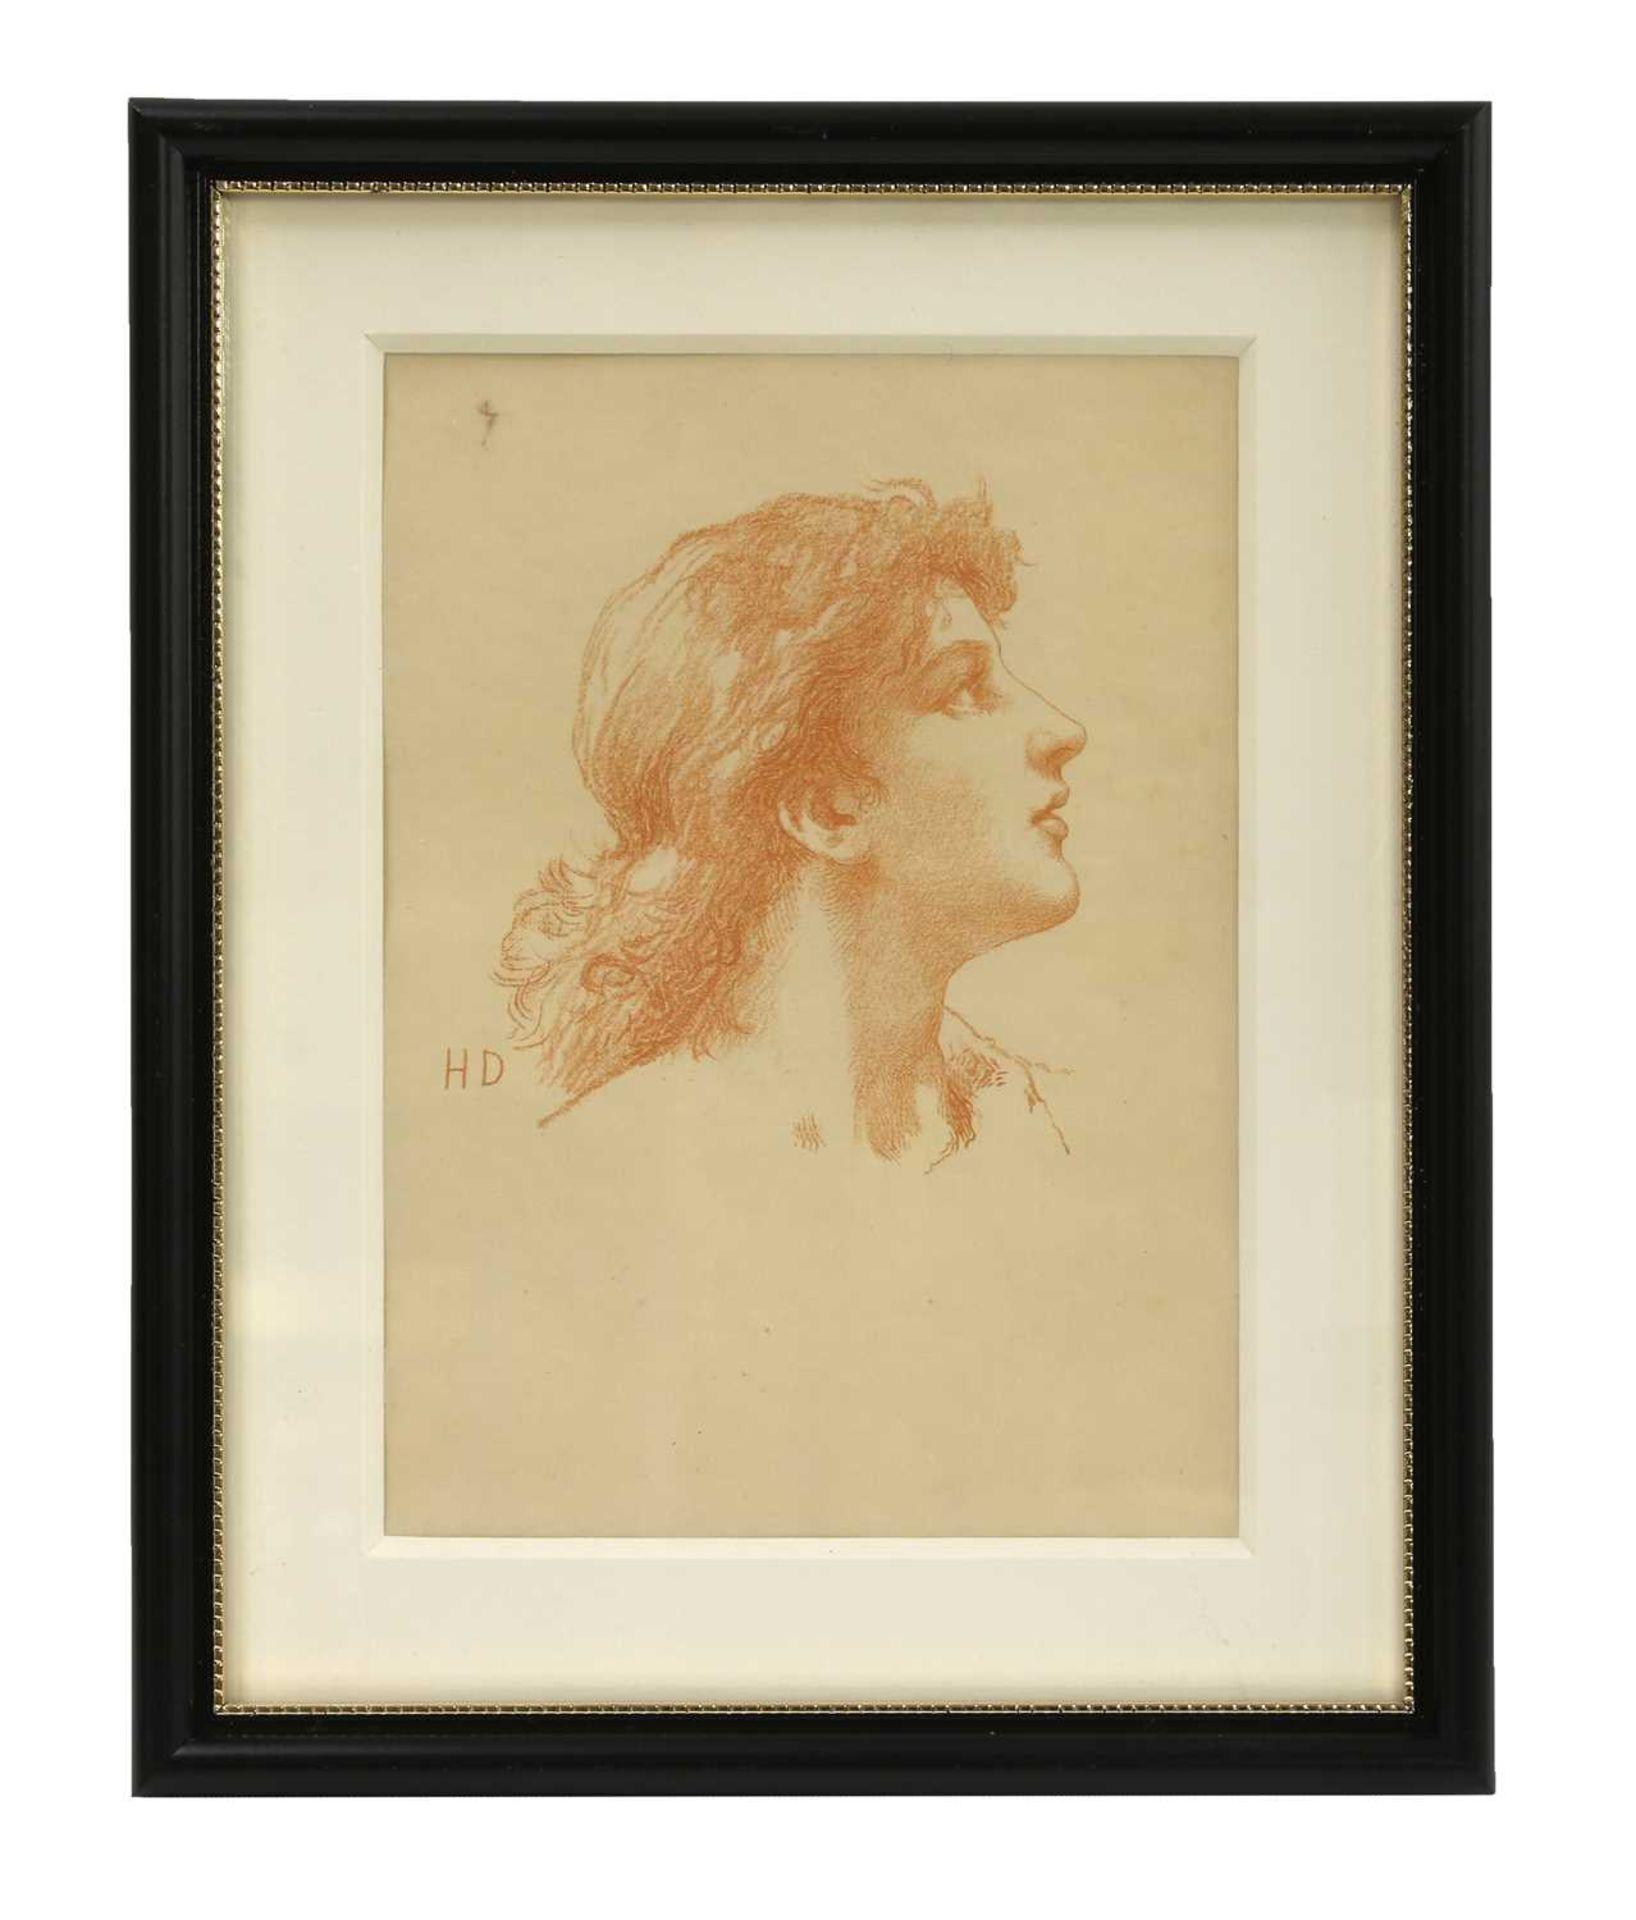 Herbert Thomas Dicksee RE (1862-1942) - Image 2 of 3